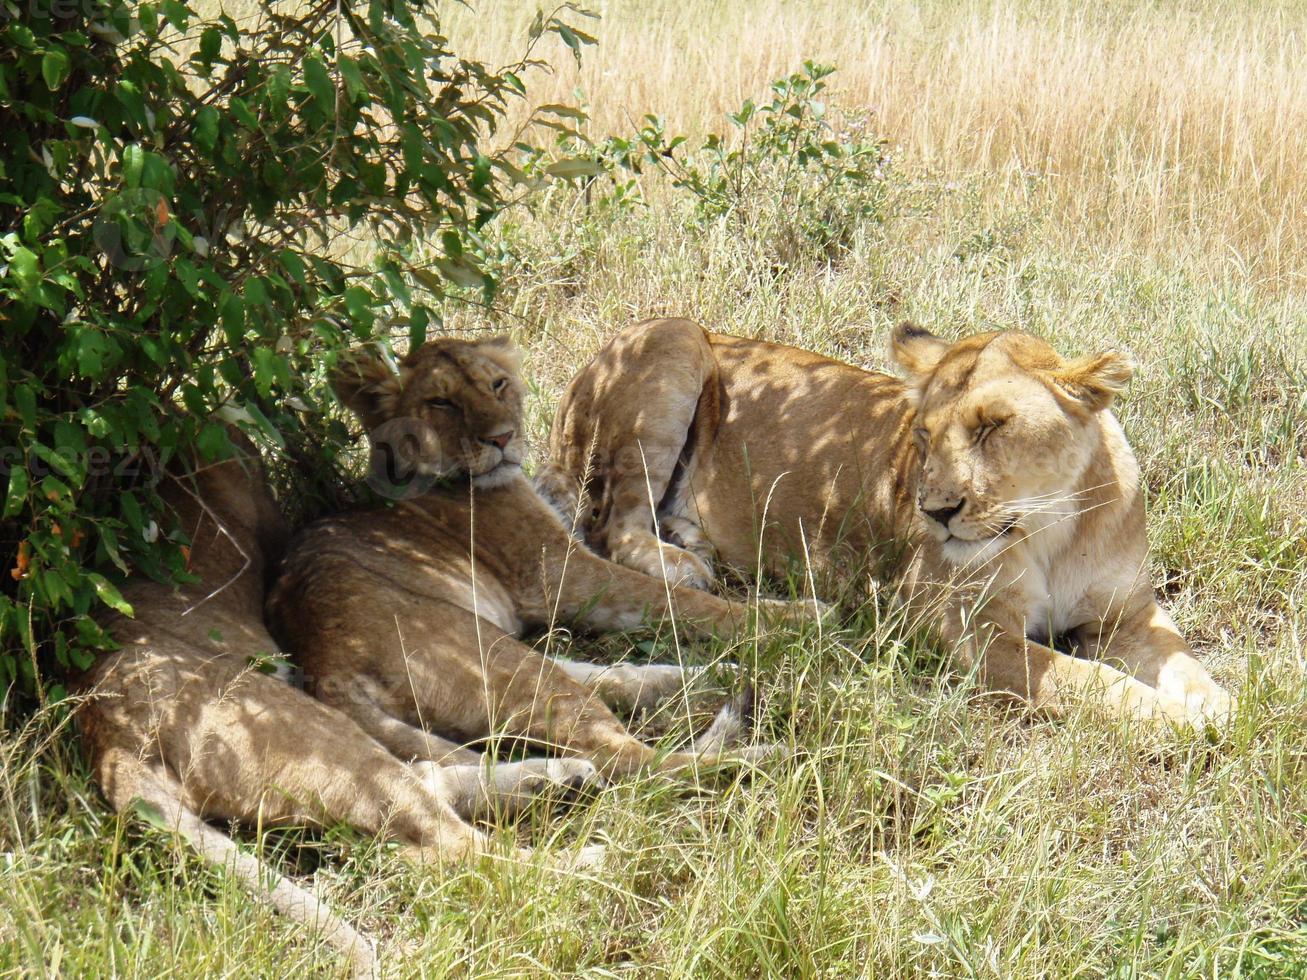 lions, dans, herbe dorée, de, les, masai mara, kenya, afrique photo